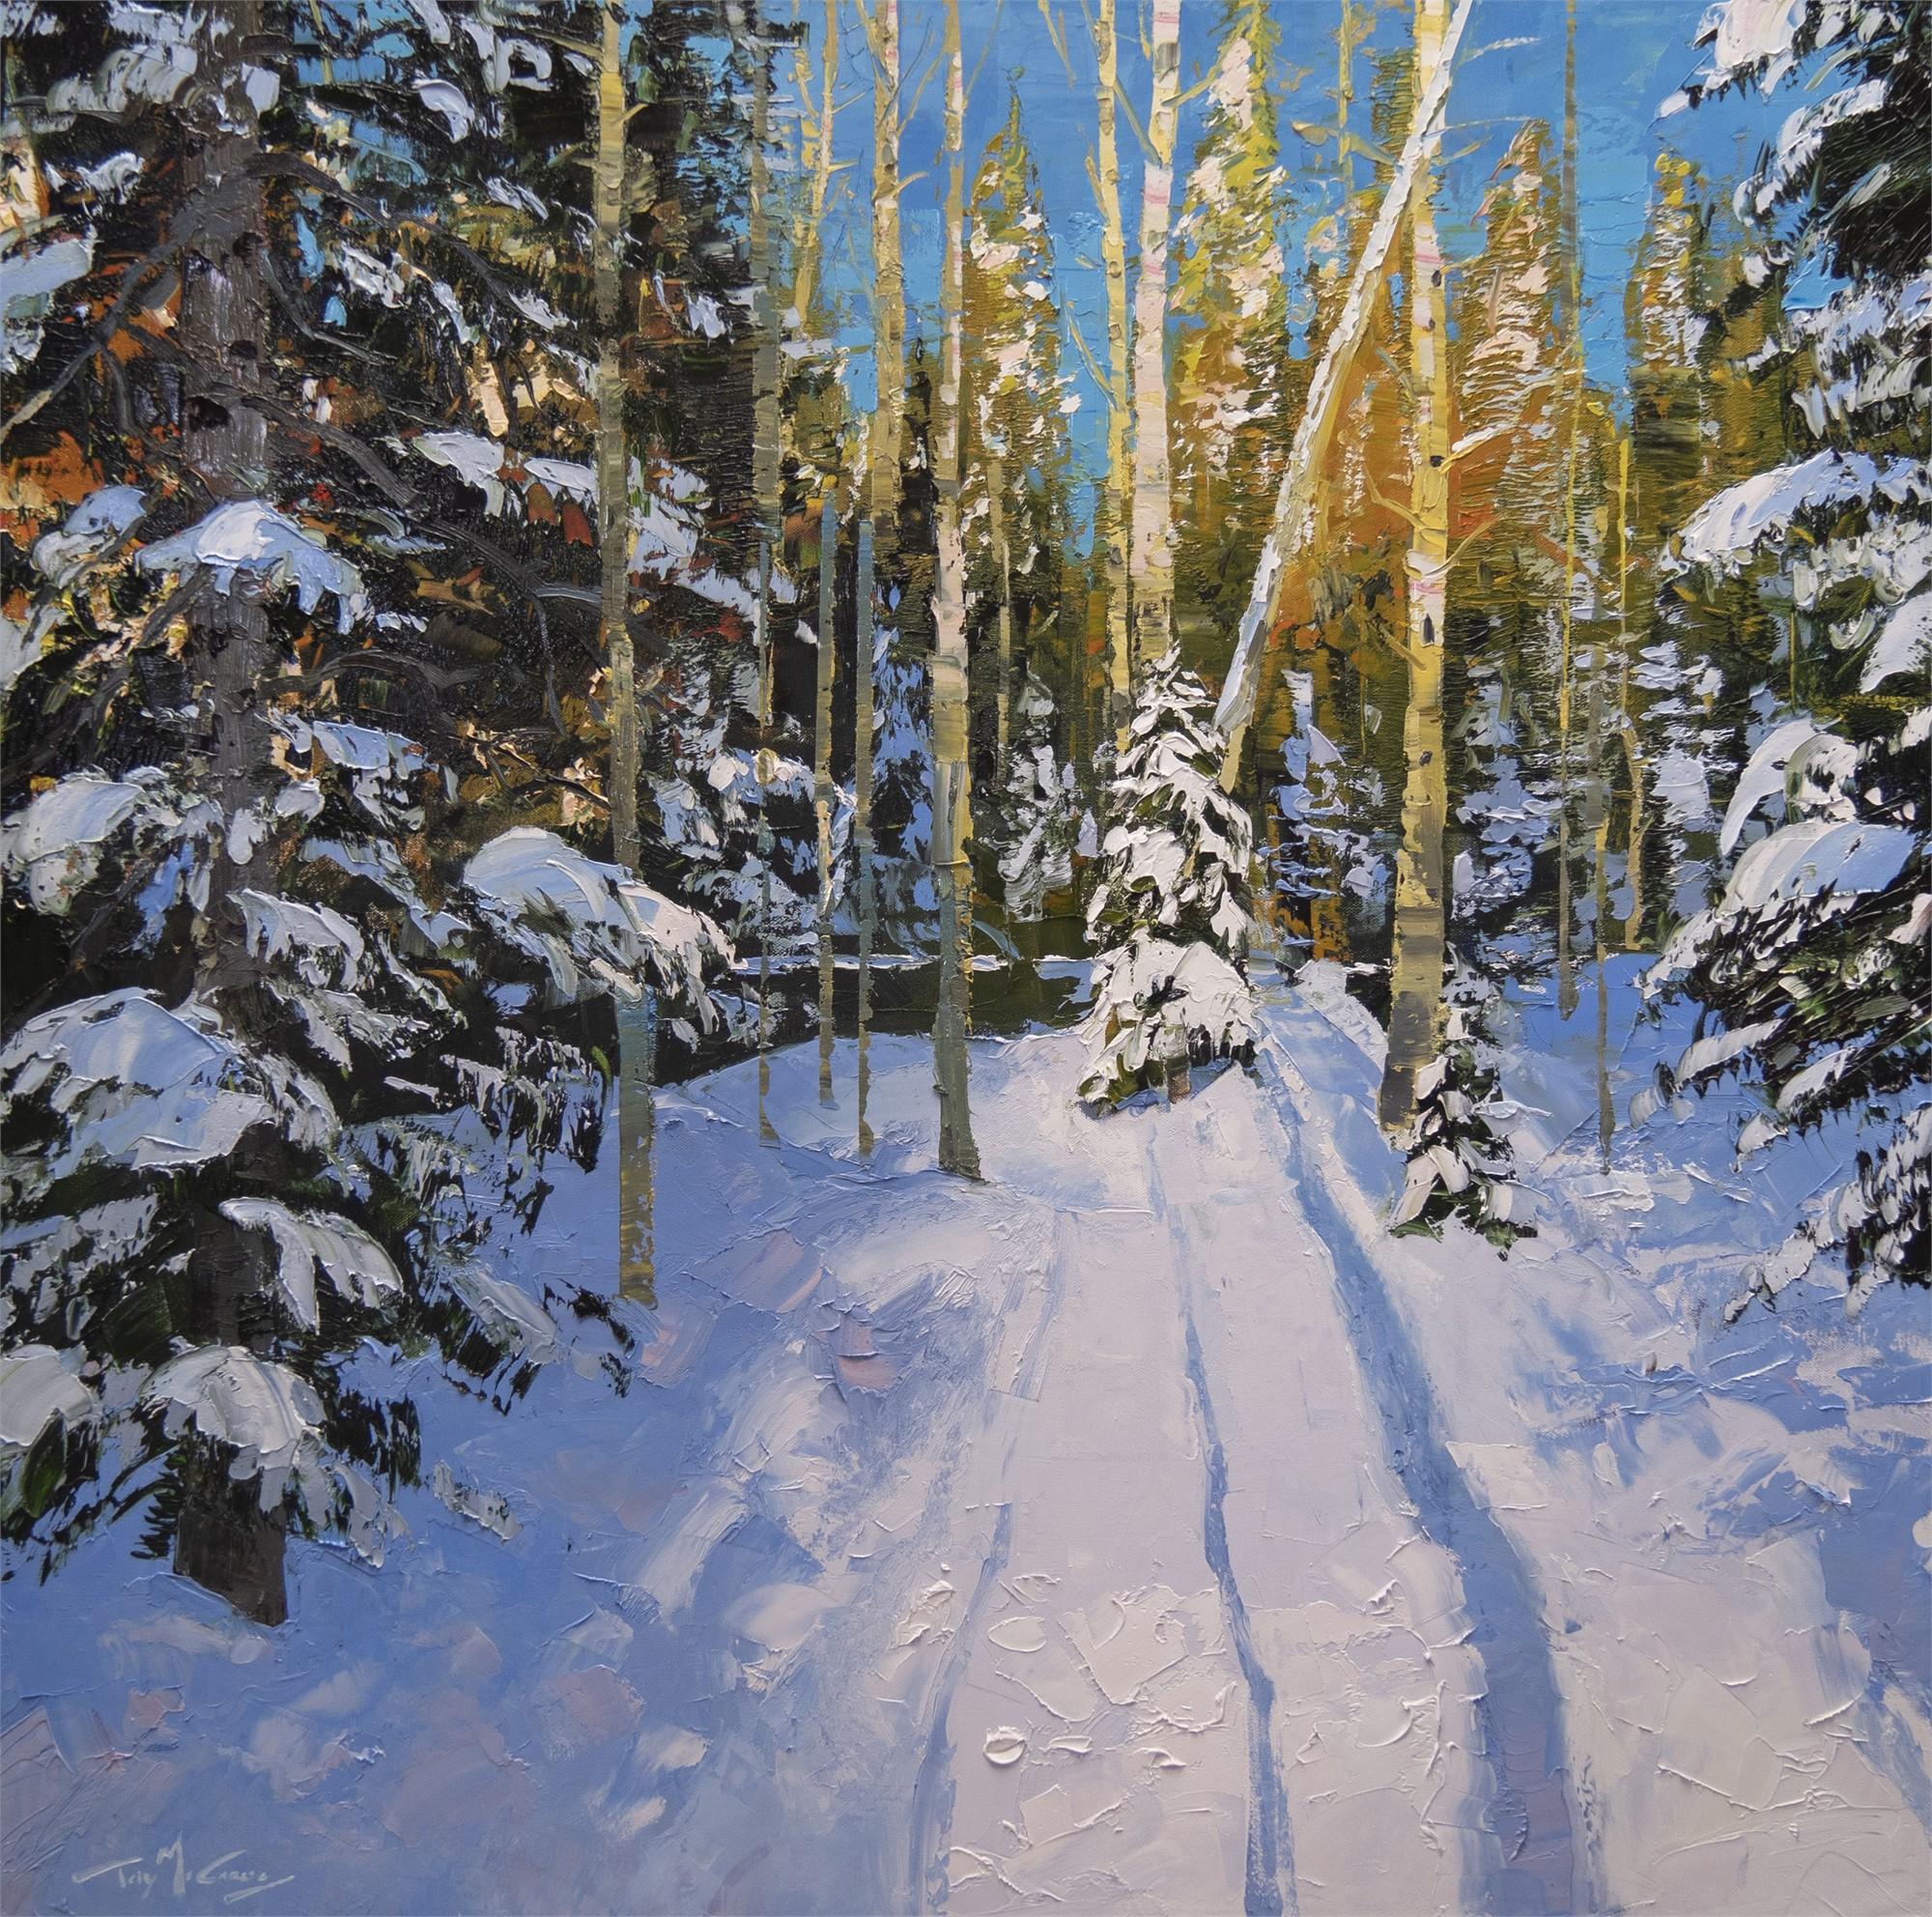 Lead Us In by Trey McCarley